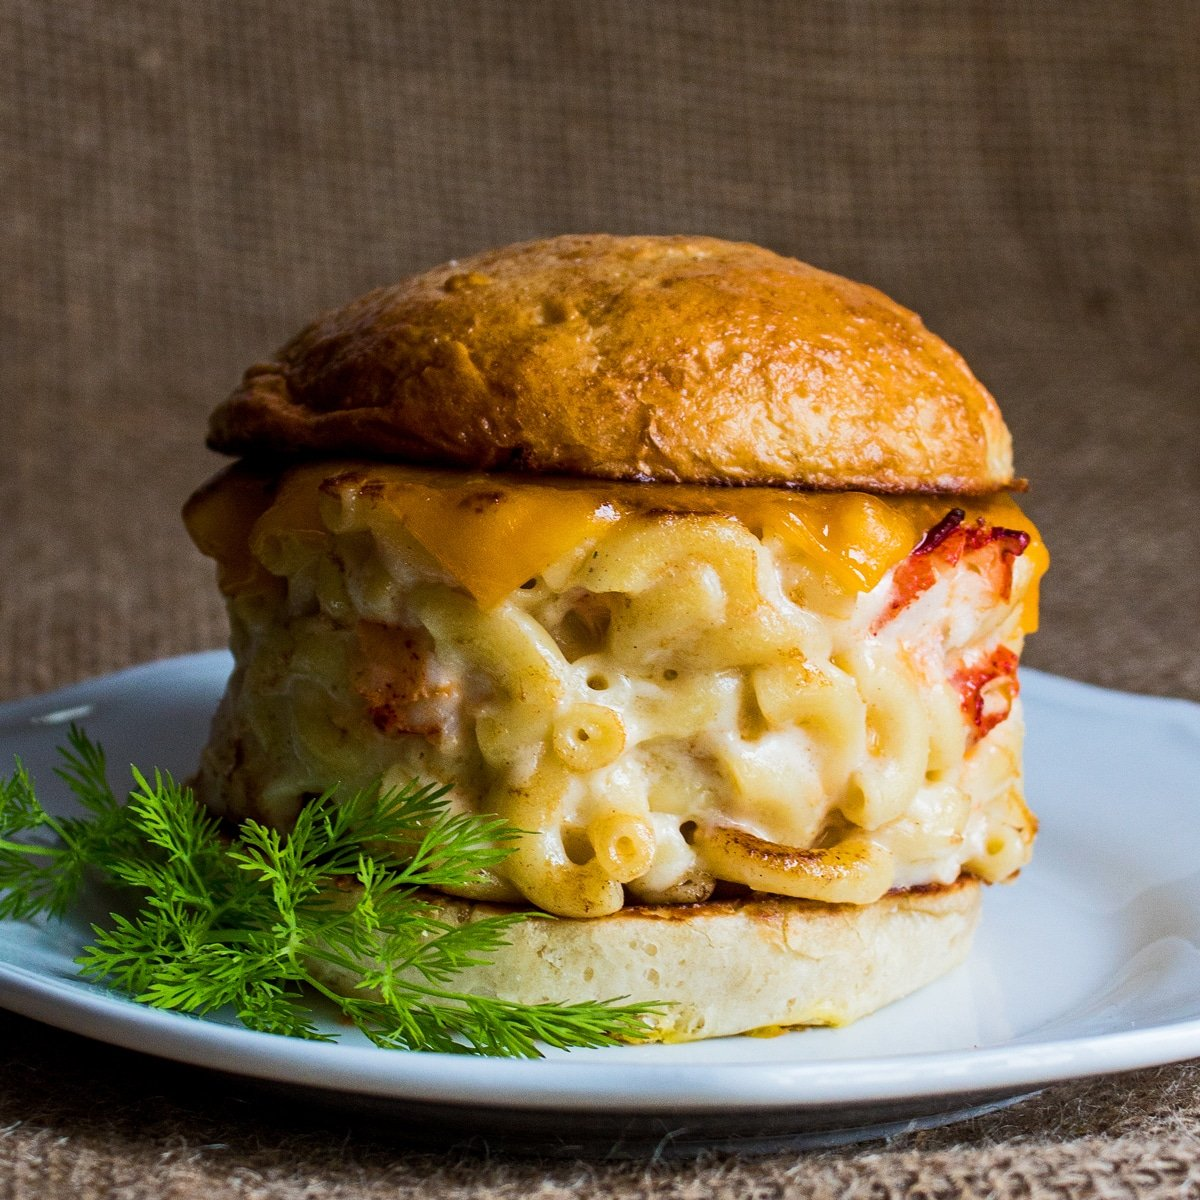 Lobster mac and cheese burger served on brioche bun.